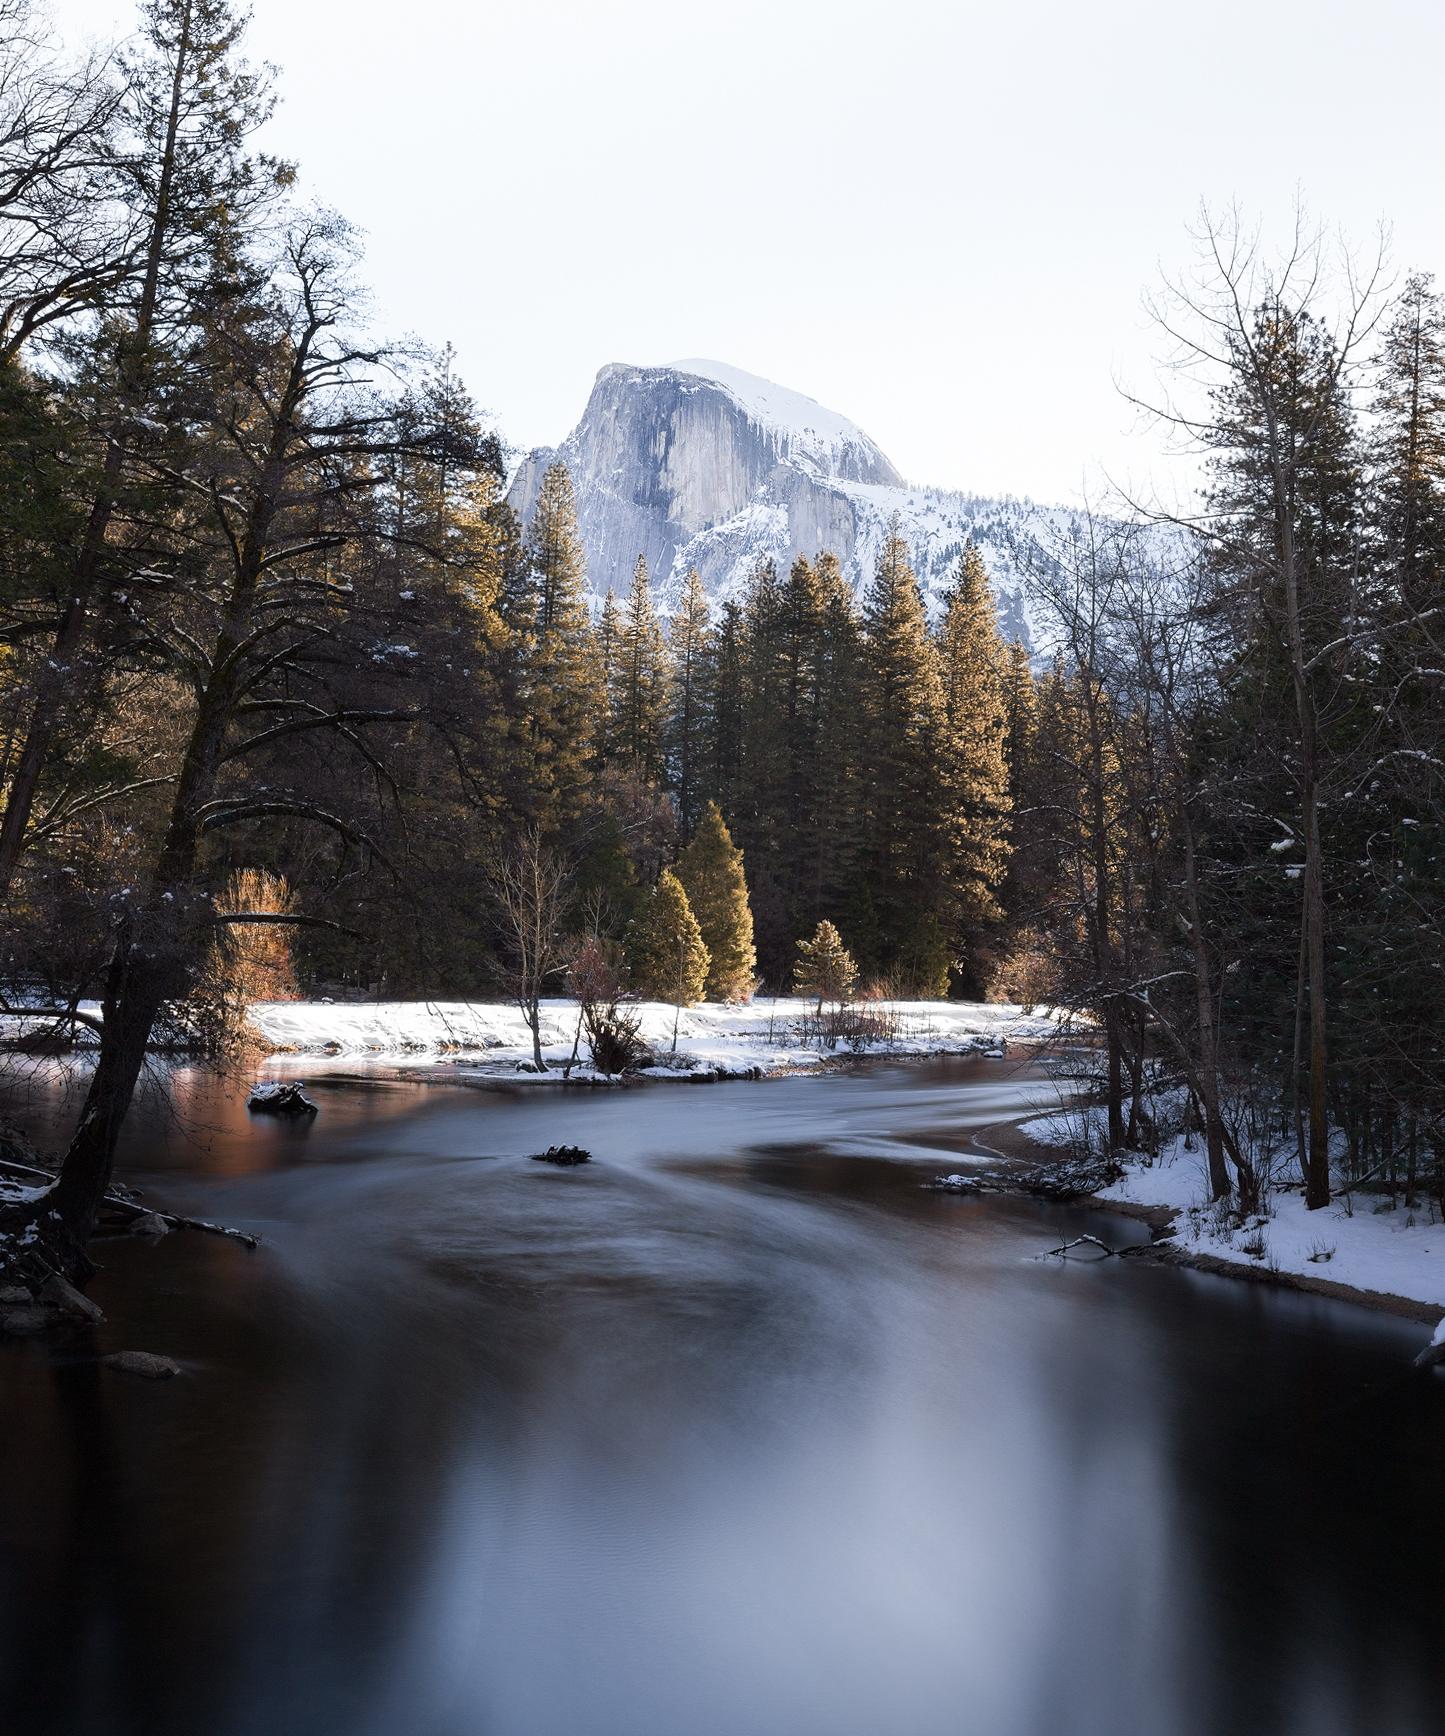 the national parks girl_sentinel bridge_long exposure_half dome_merced river_yosemite national park_yosemite_winter_canon6d.JPG